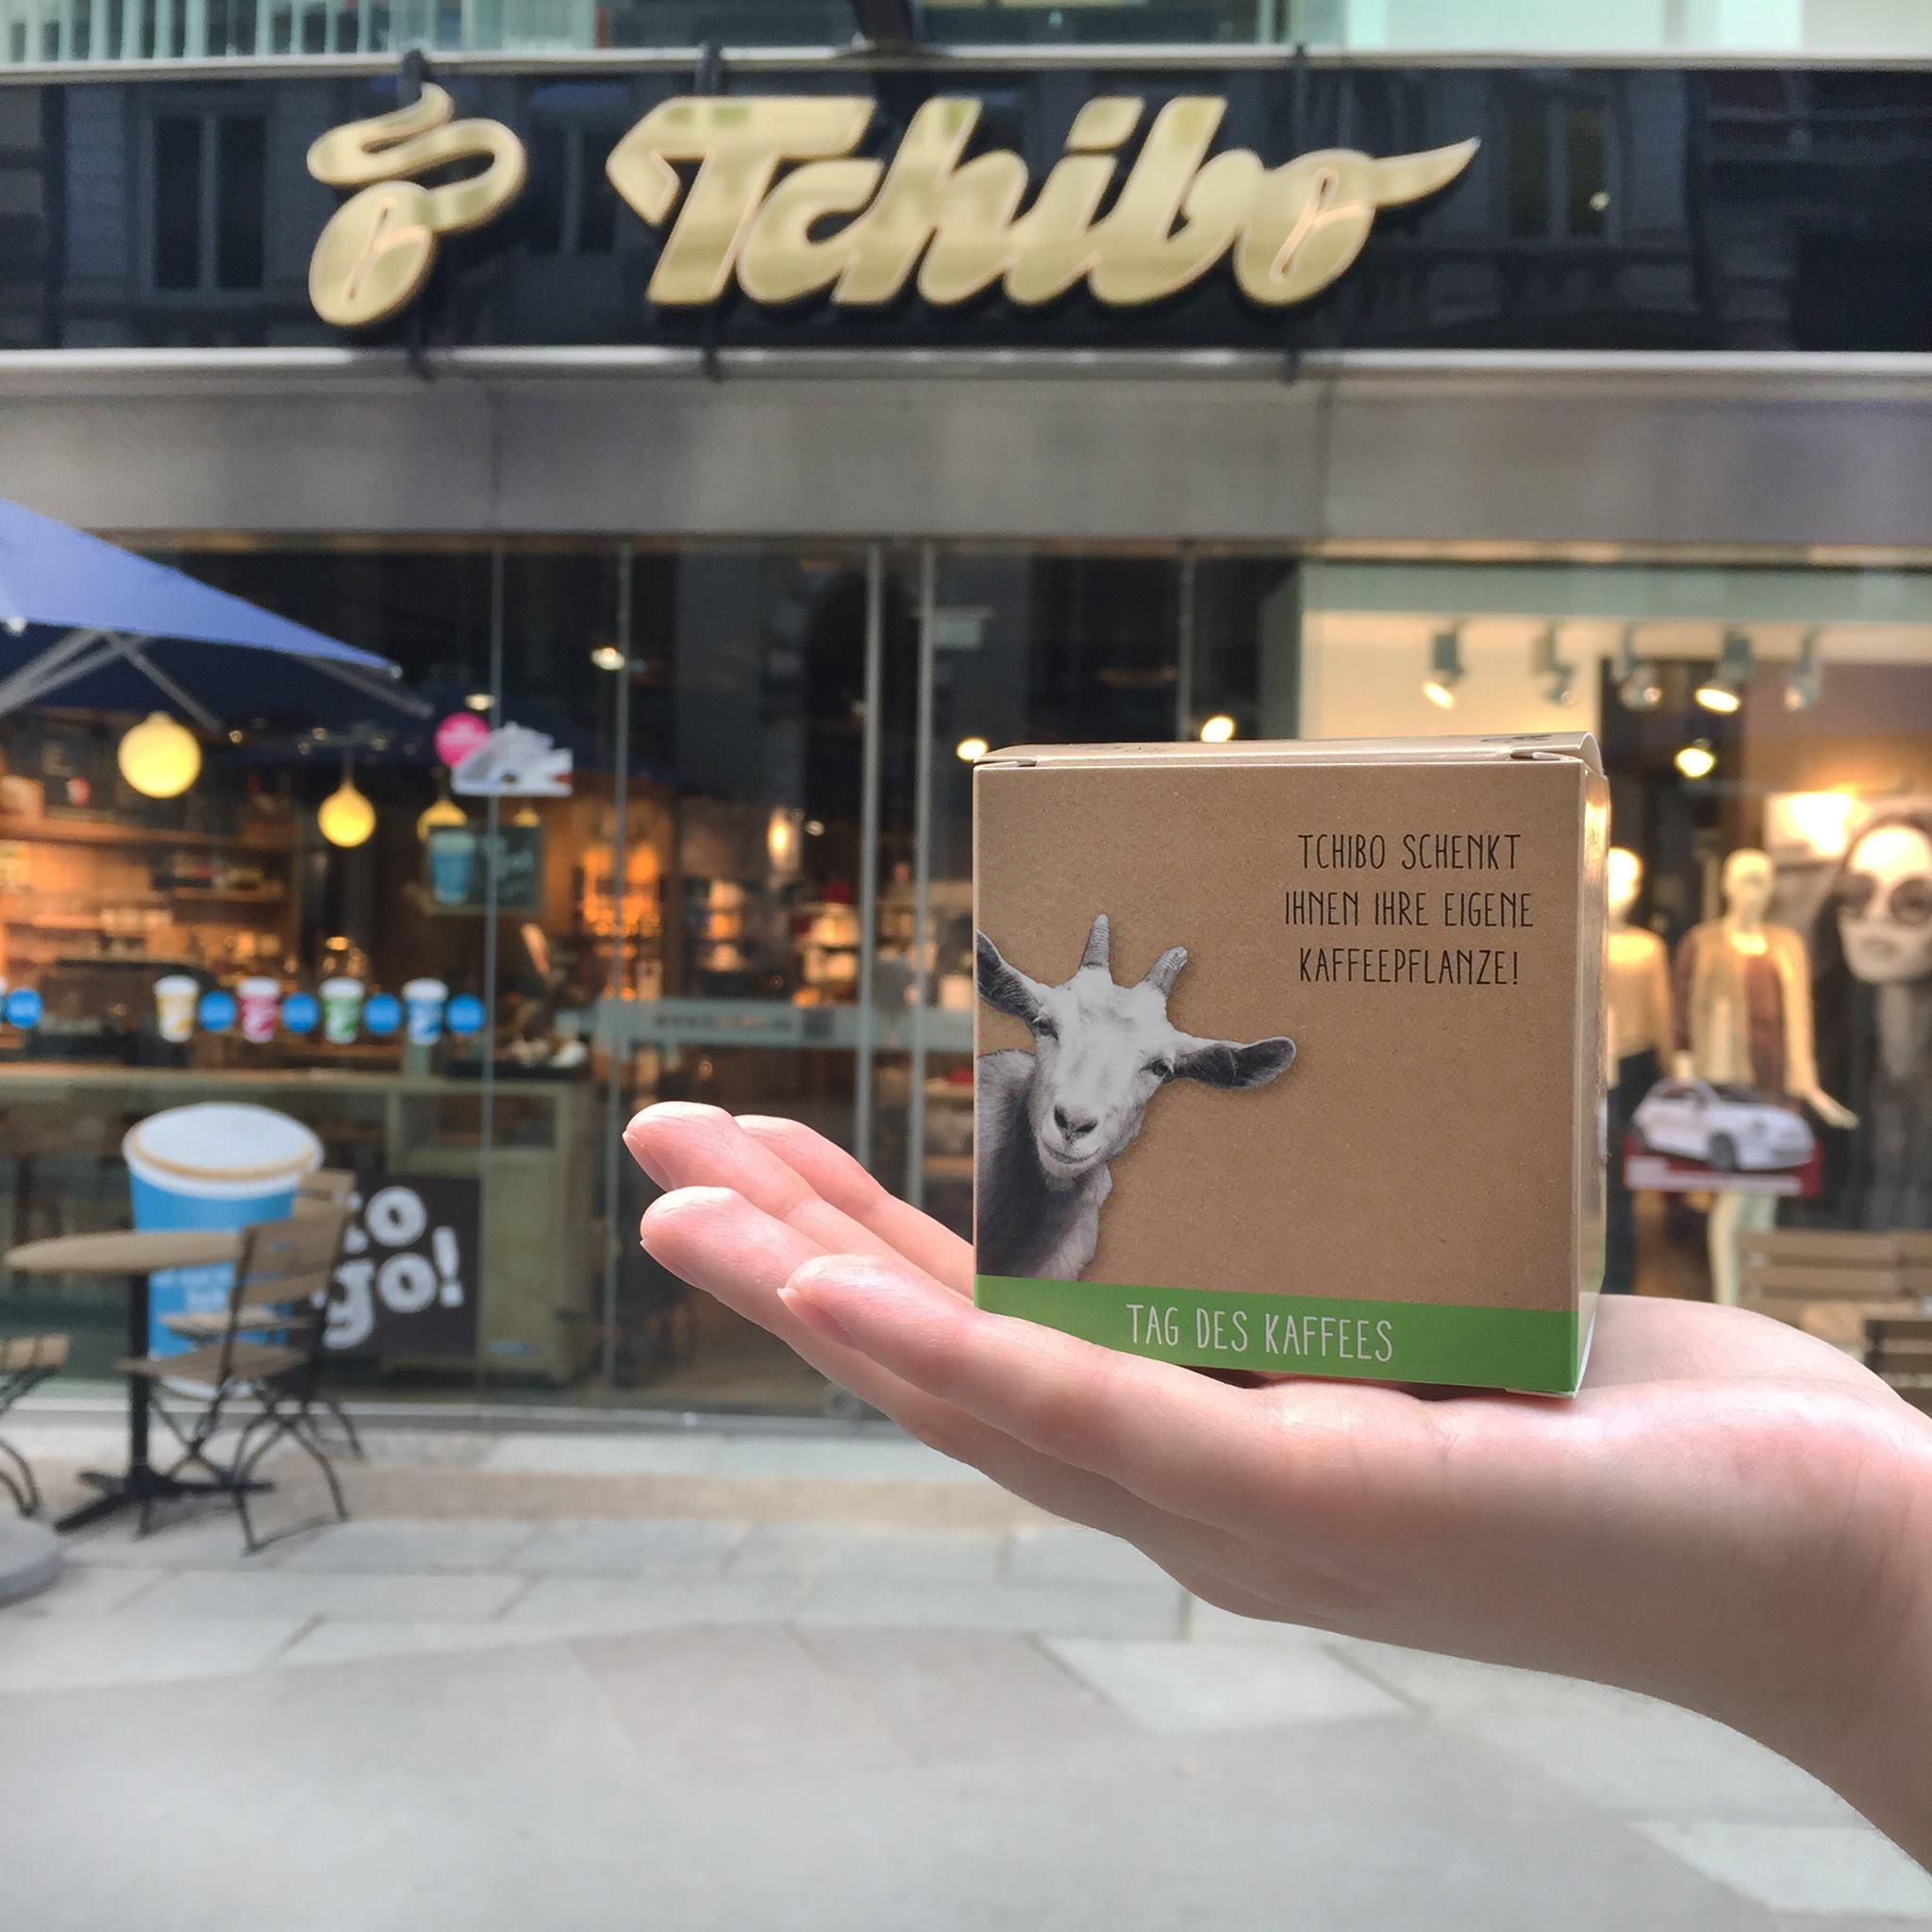 kostenlose Kaffeepflanze am 01.10. bei Tchibo